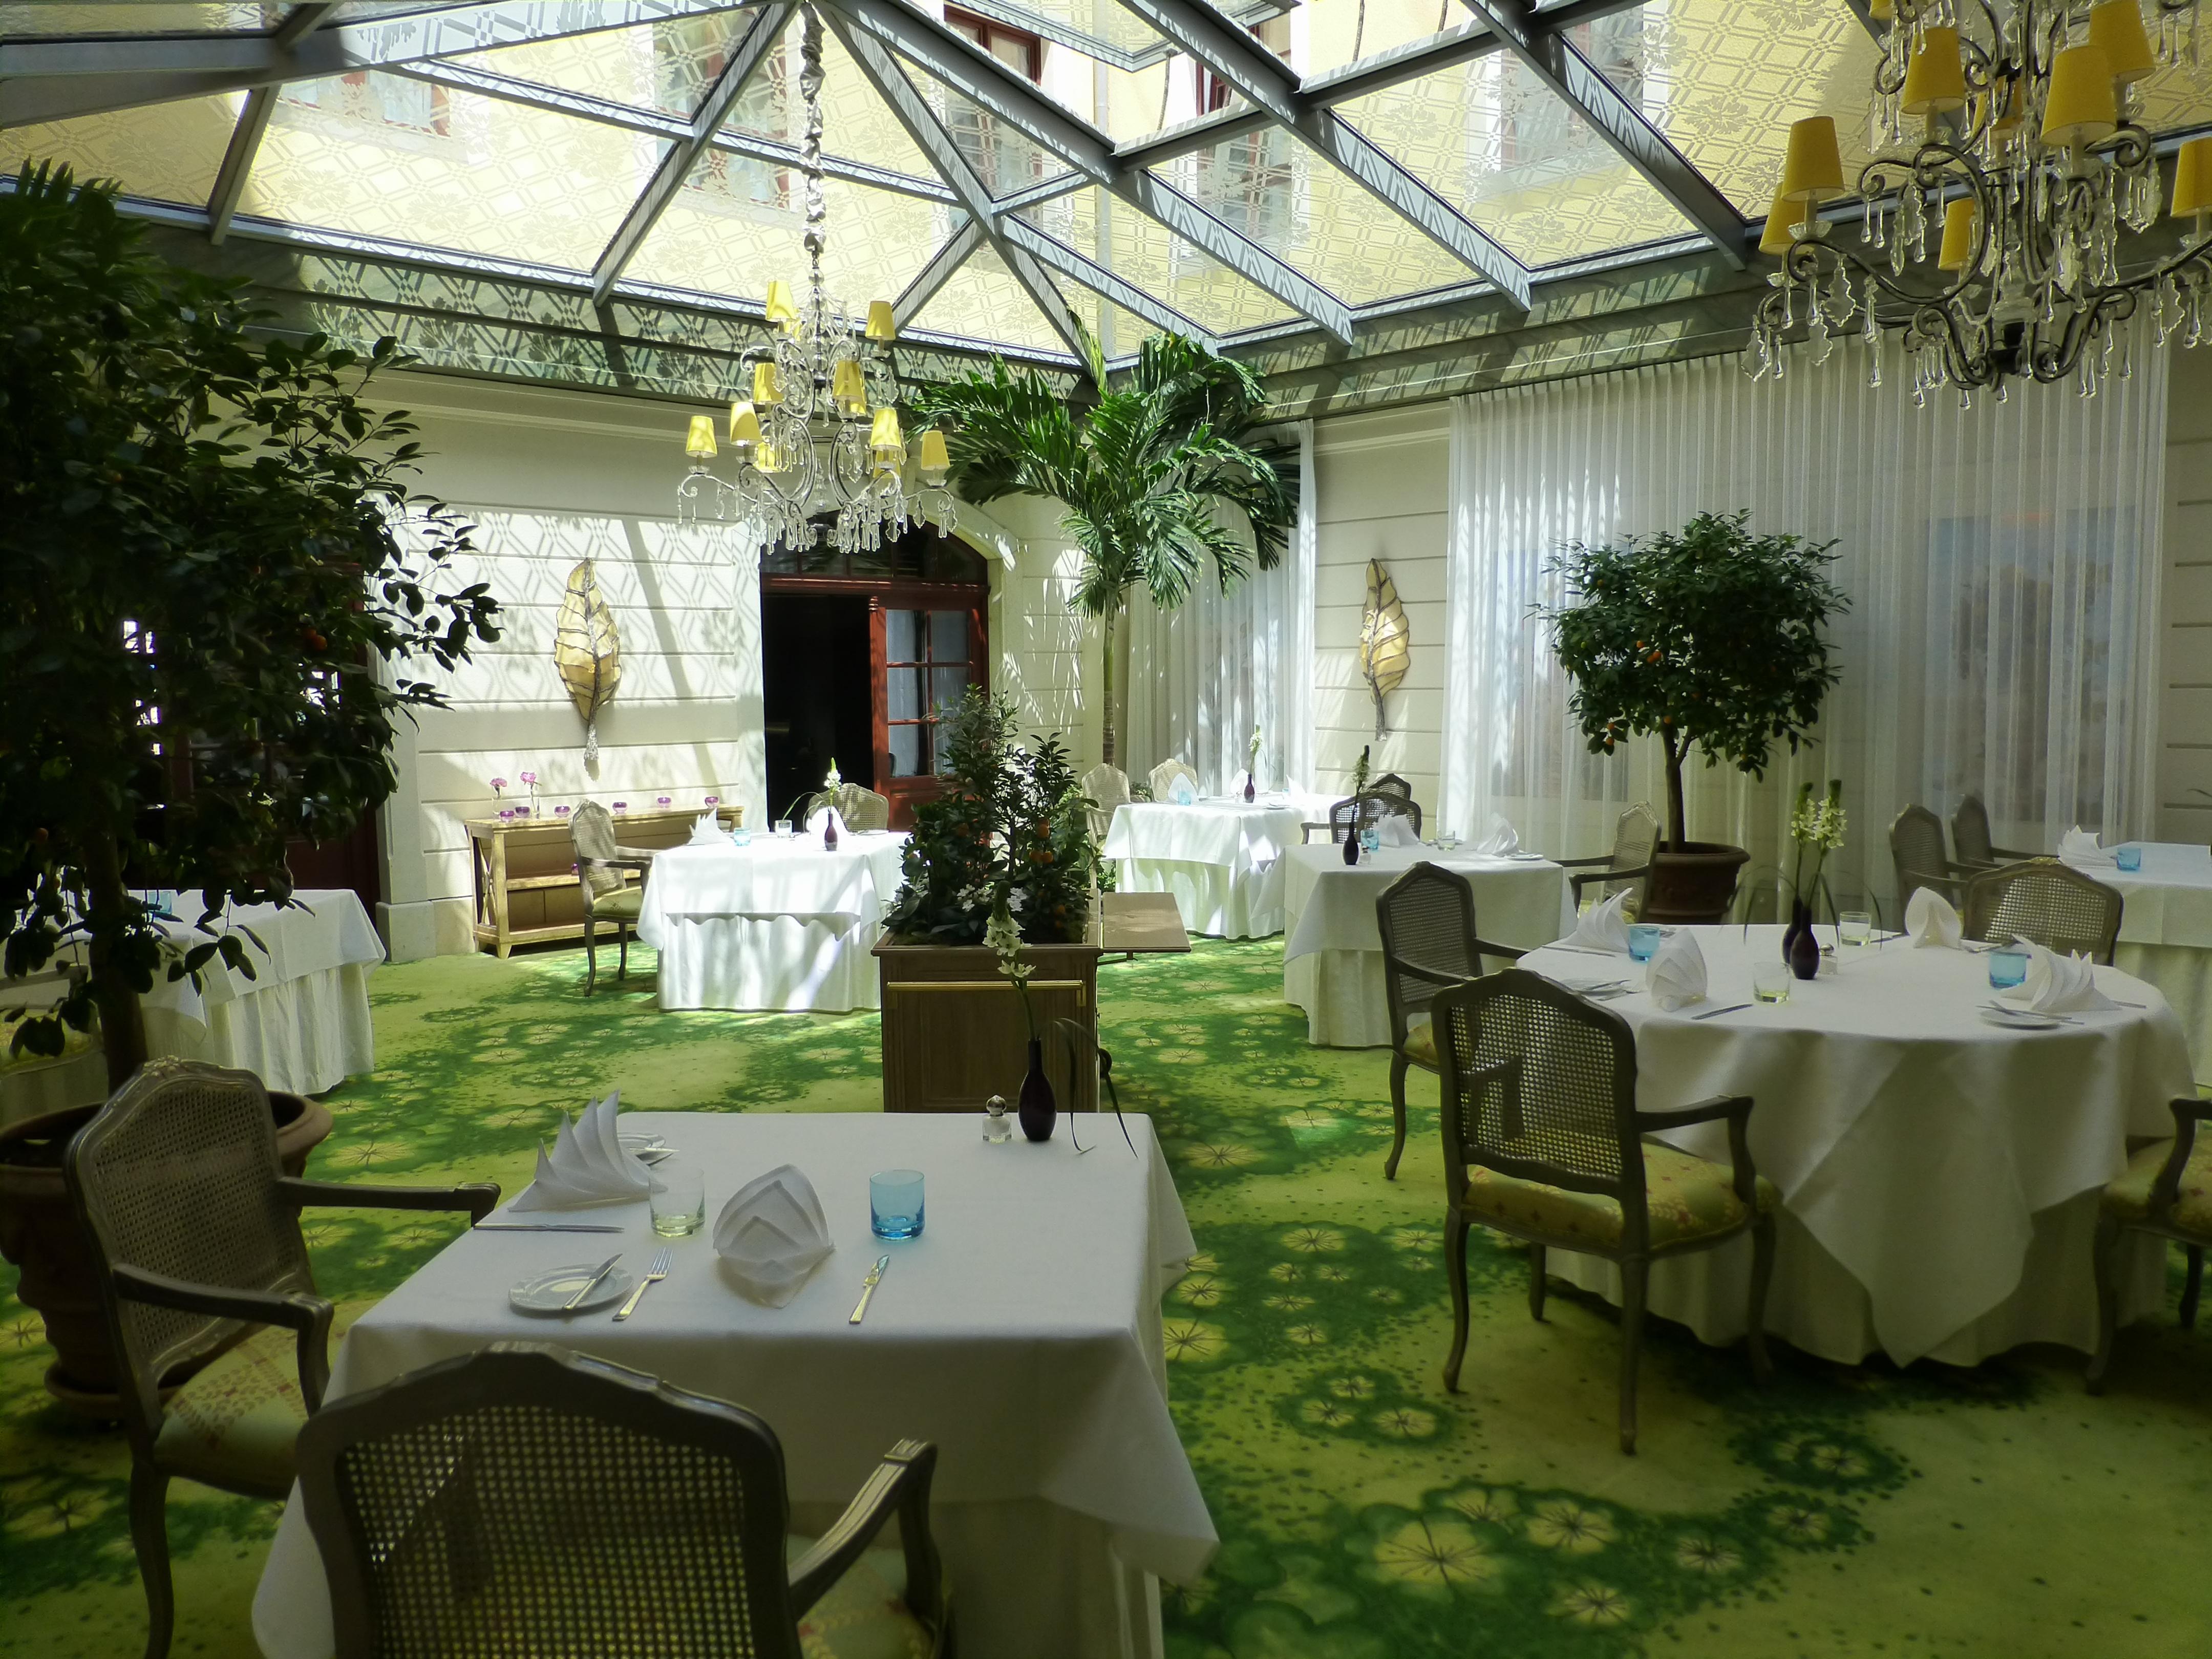 Free Images : flower, restaurant, home, meal, backyard ...